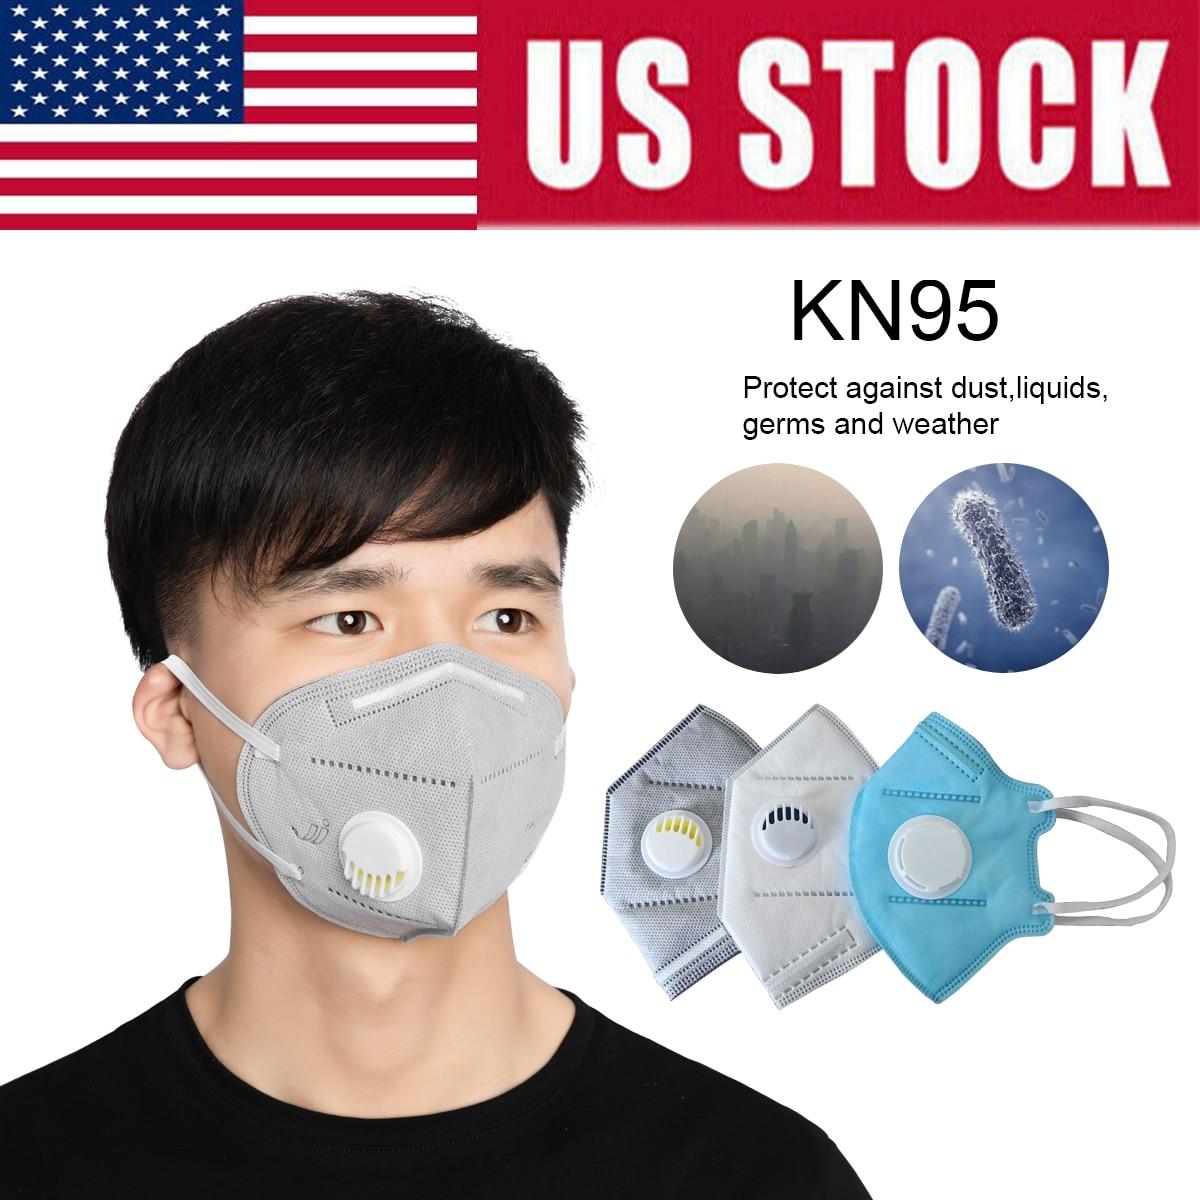 10pcs Mask KN95 PM2.5 Anti Flu Formaldehyde Bacteria Face Mask Dust-proof Mouth Masks Stock US/CN